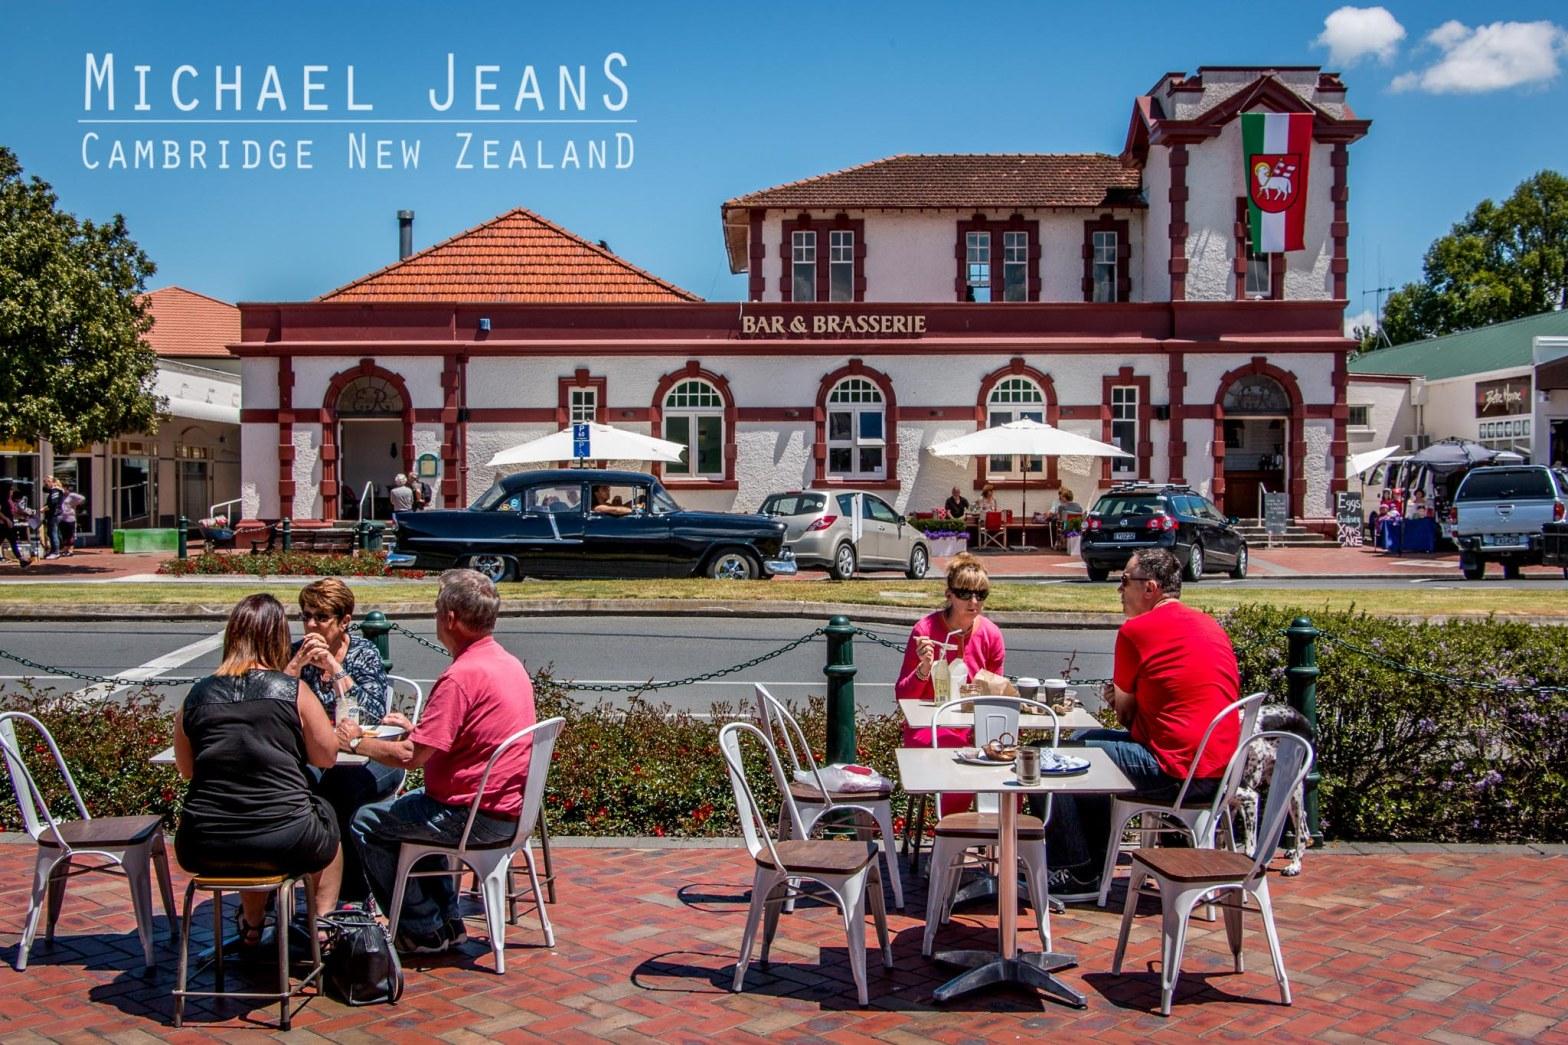 Outdoor dining Victoria Street Cambridge New Zealand